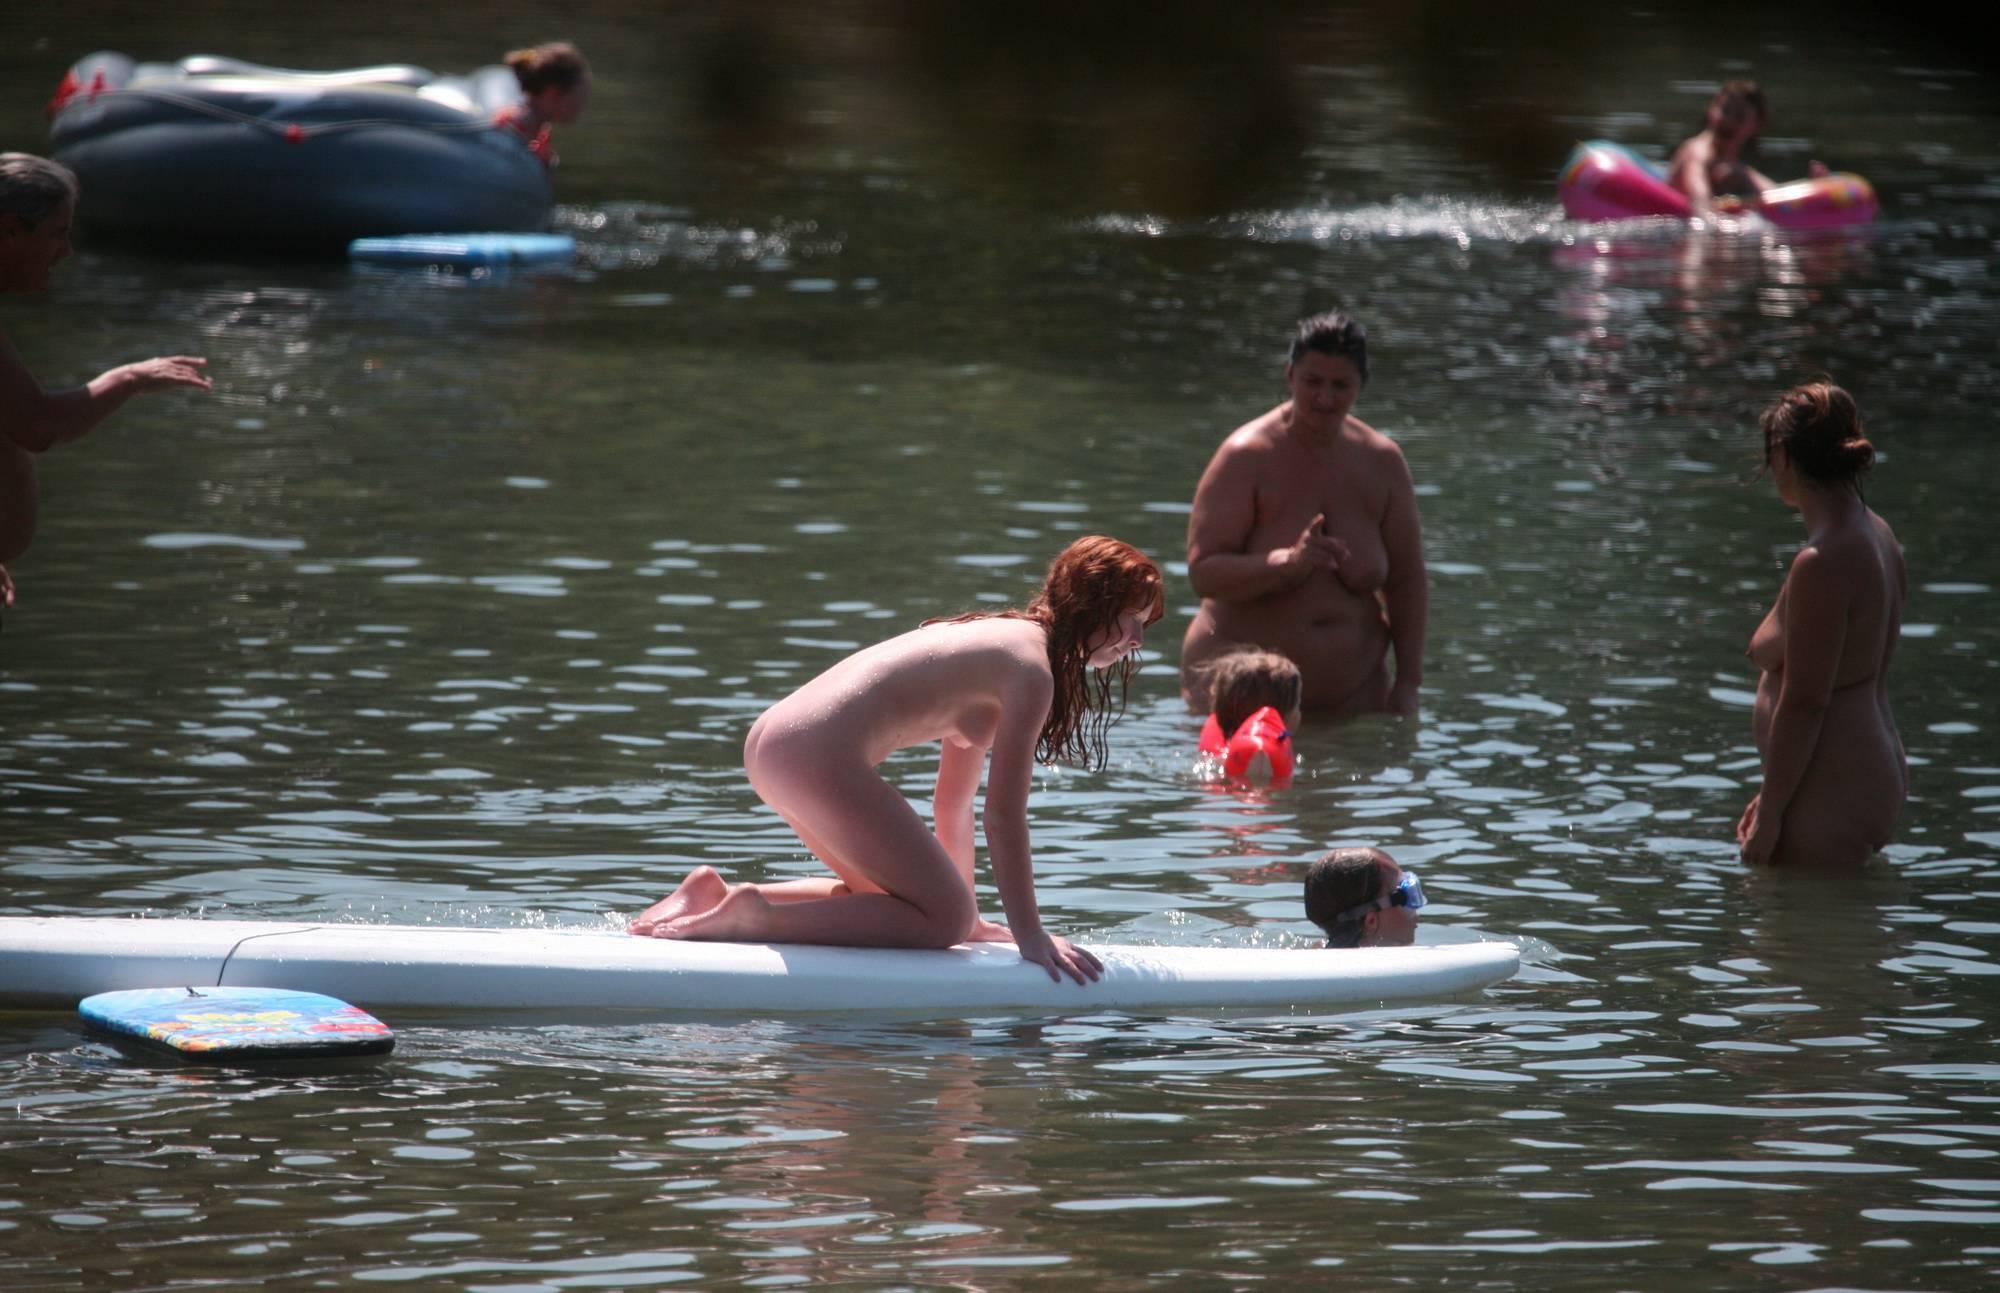 Pure Nudism Images Nudist Park Canoe Waters - 1